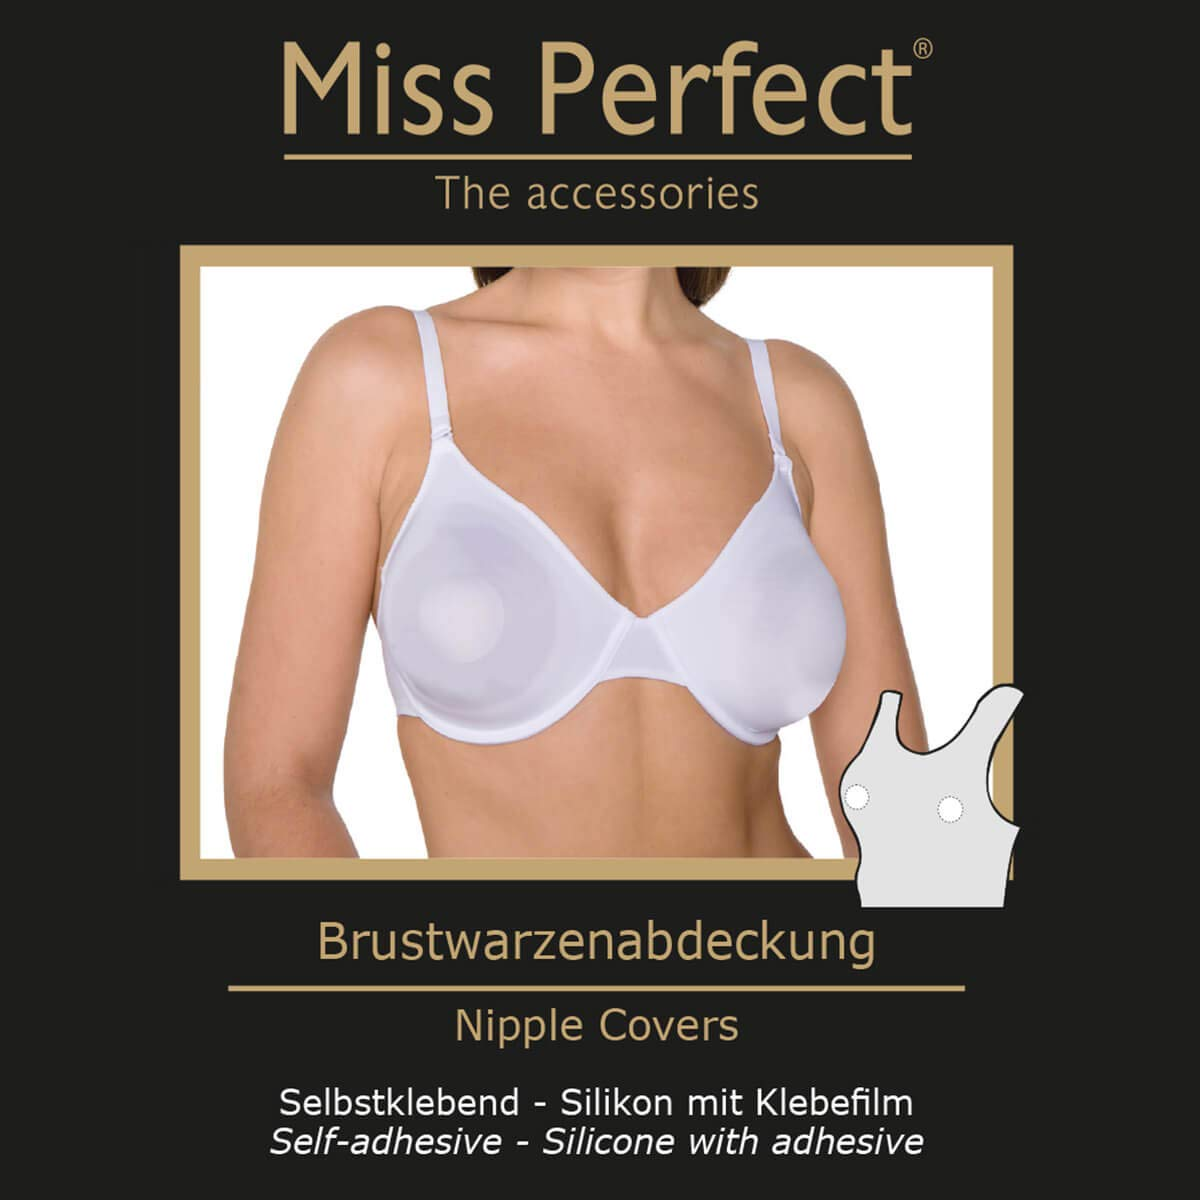 Miss Perfect Brustwarzenabdeckung